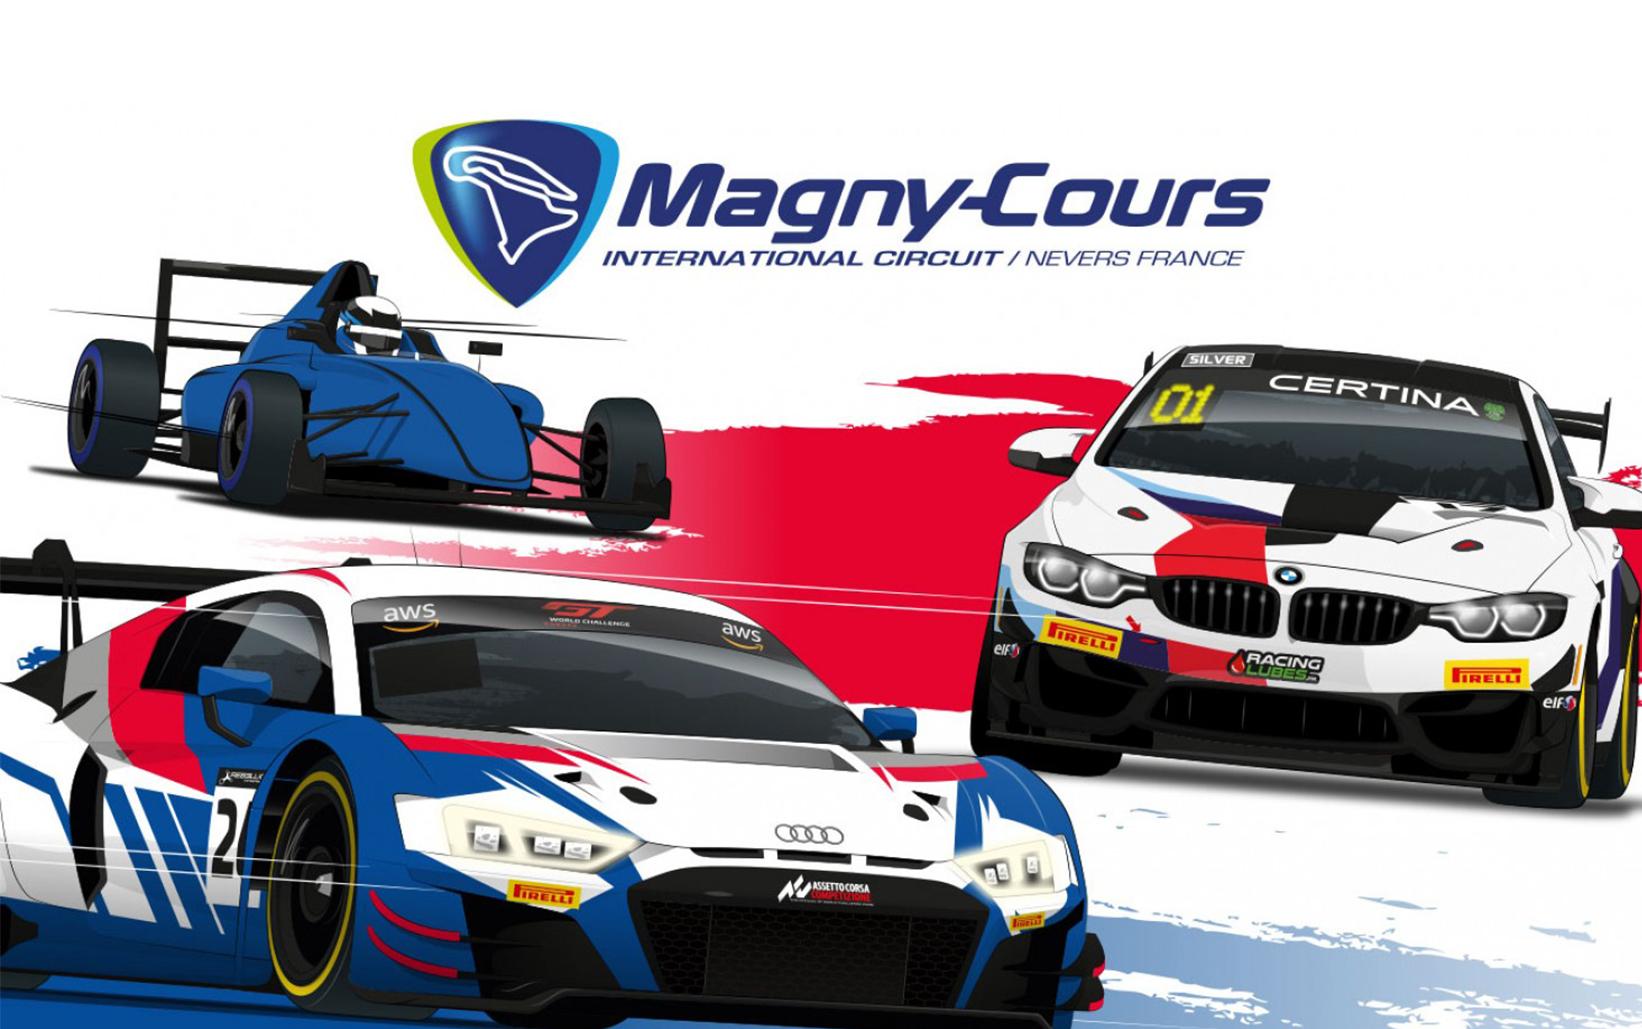 Championnat de France des Circuits